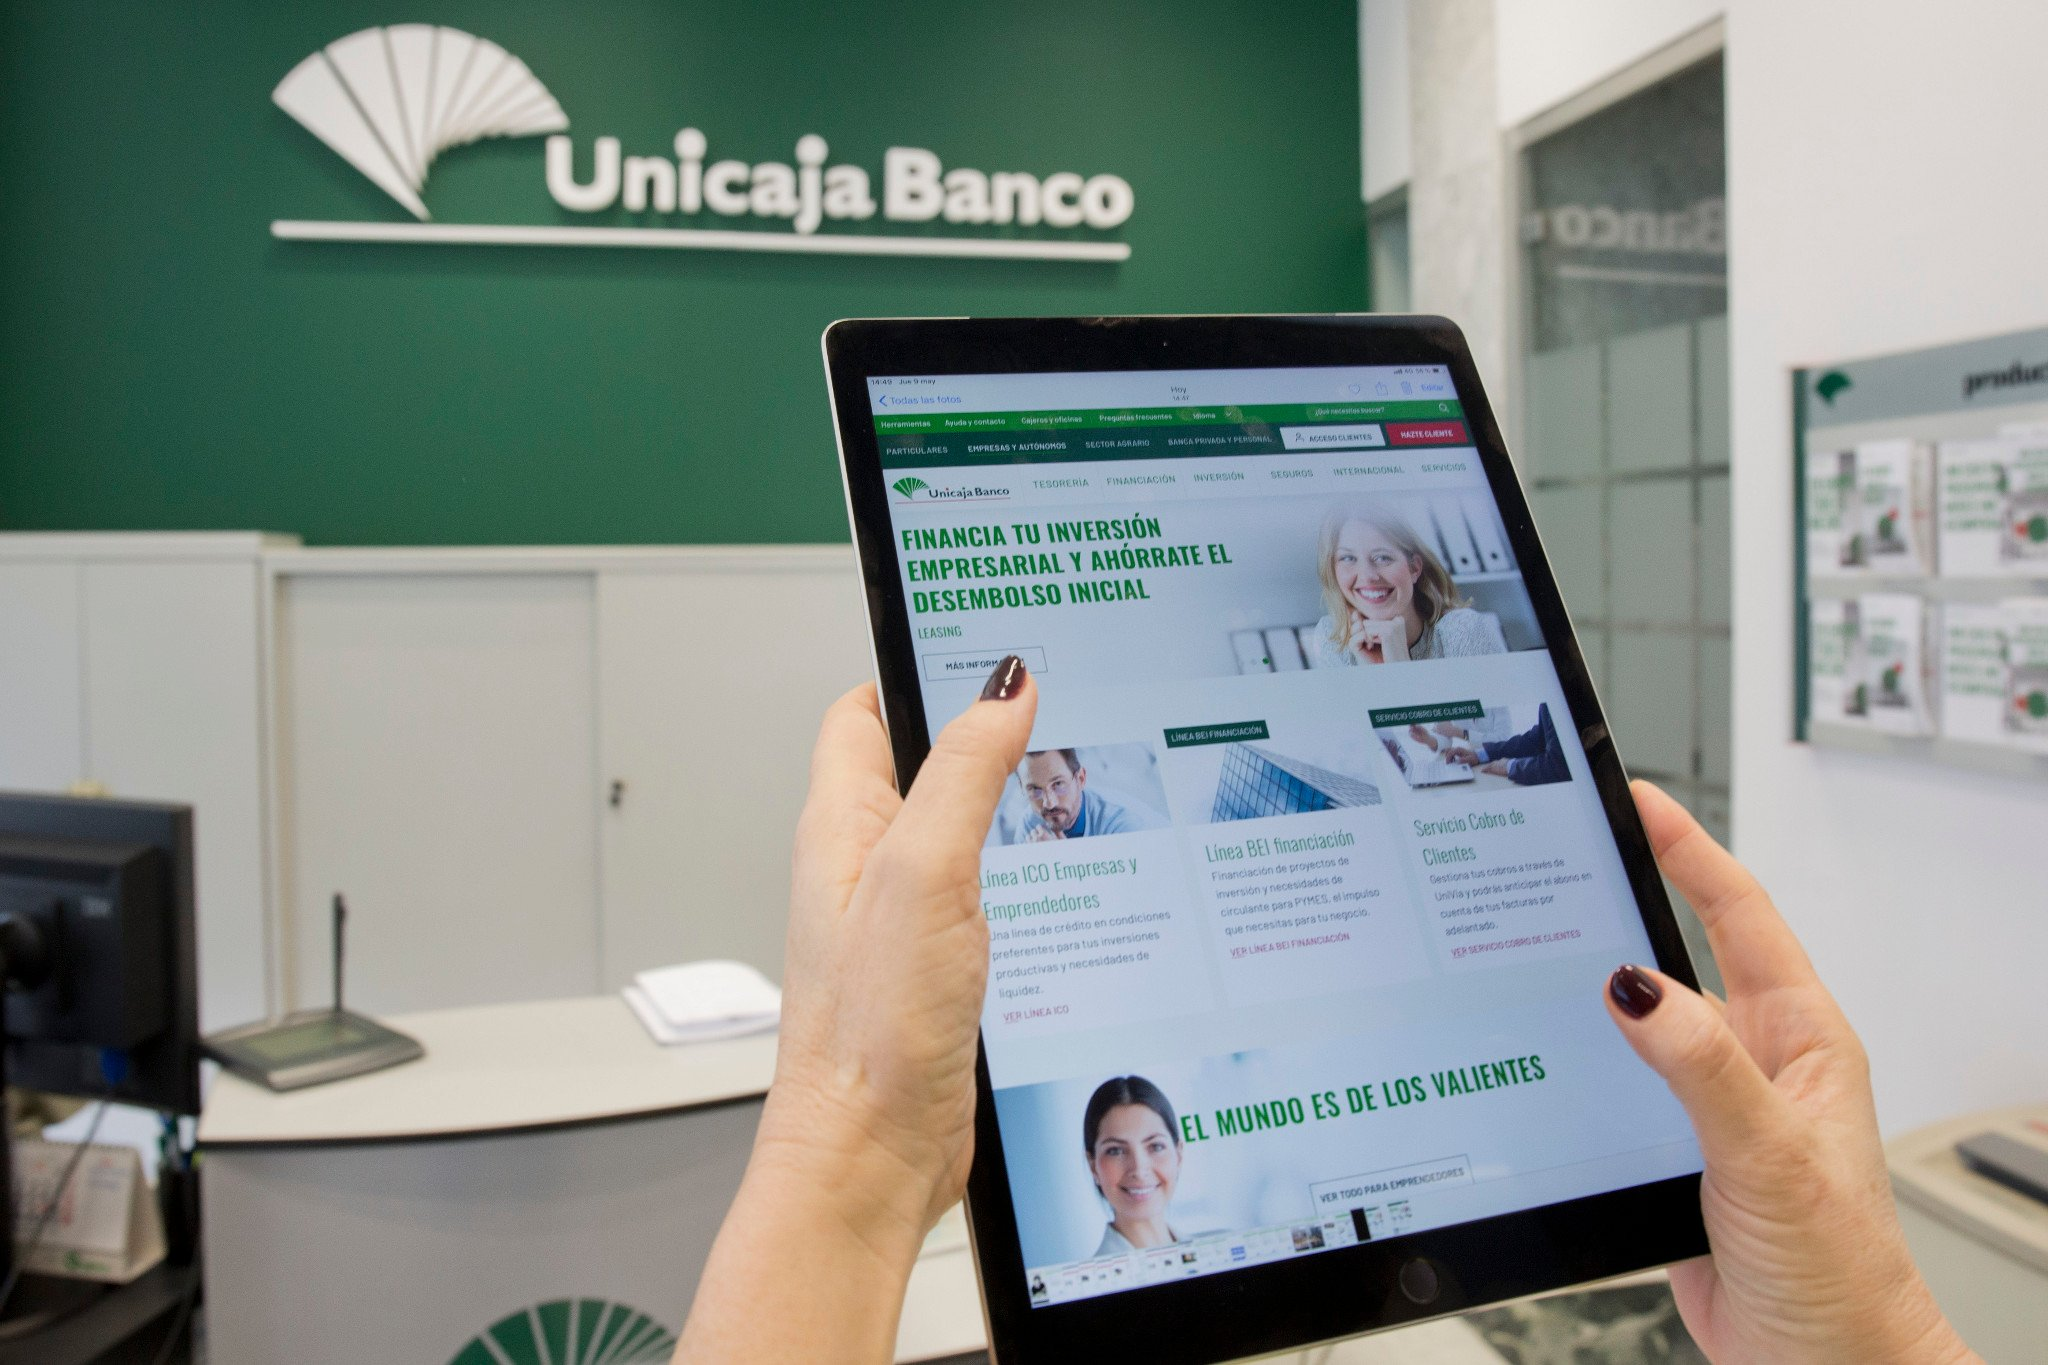 Unicaja_Banco_apuesta_por_empresas